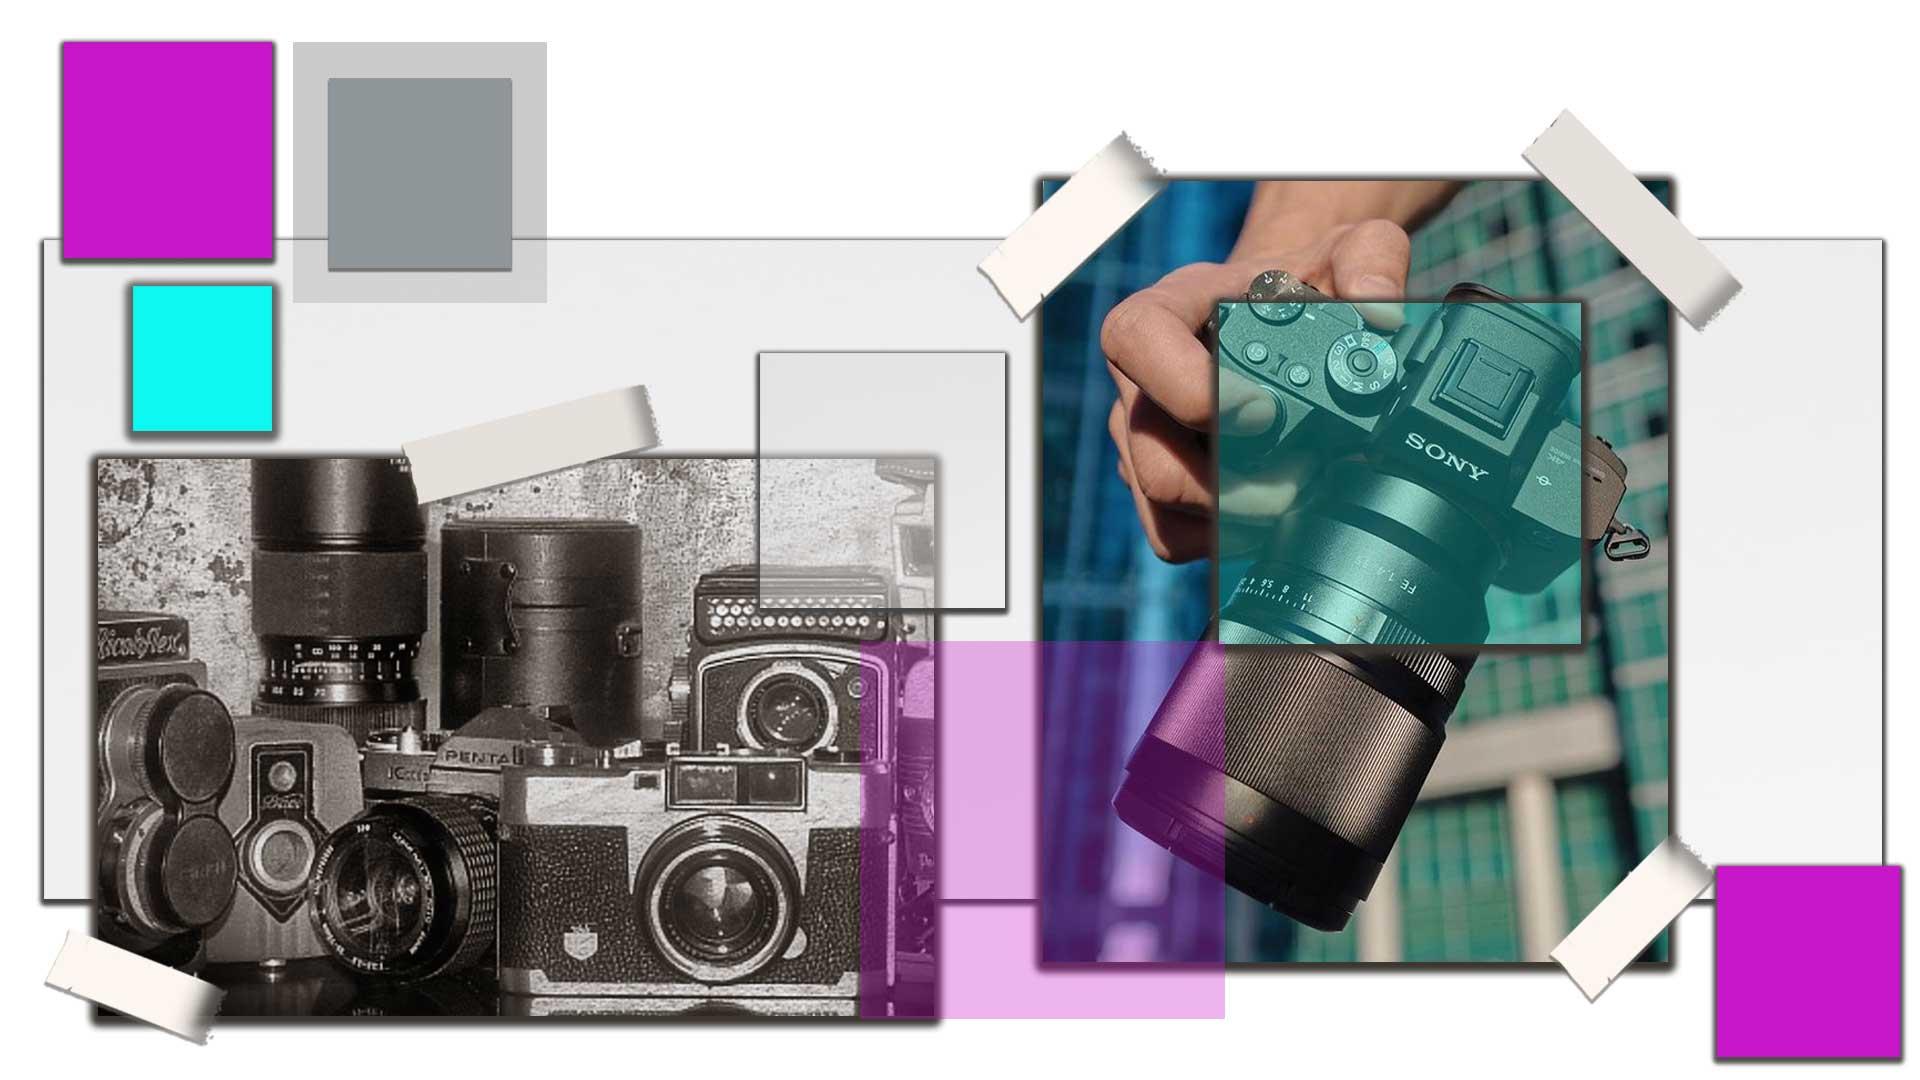 professiona1 photographe 3a - چگونه میتوان حرفه عکاسی را برای همیشه داشت ؟